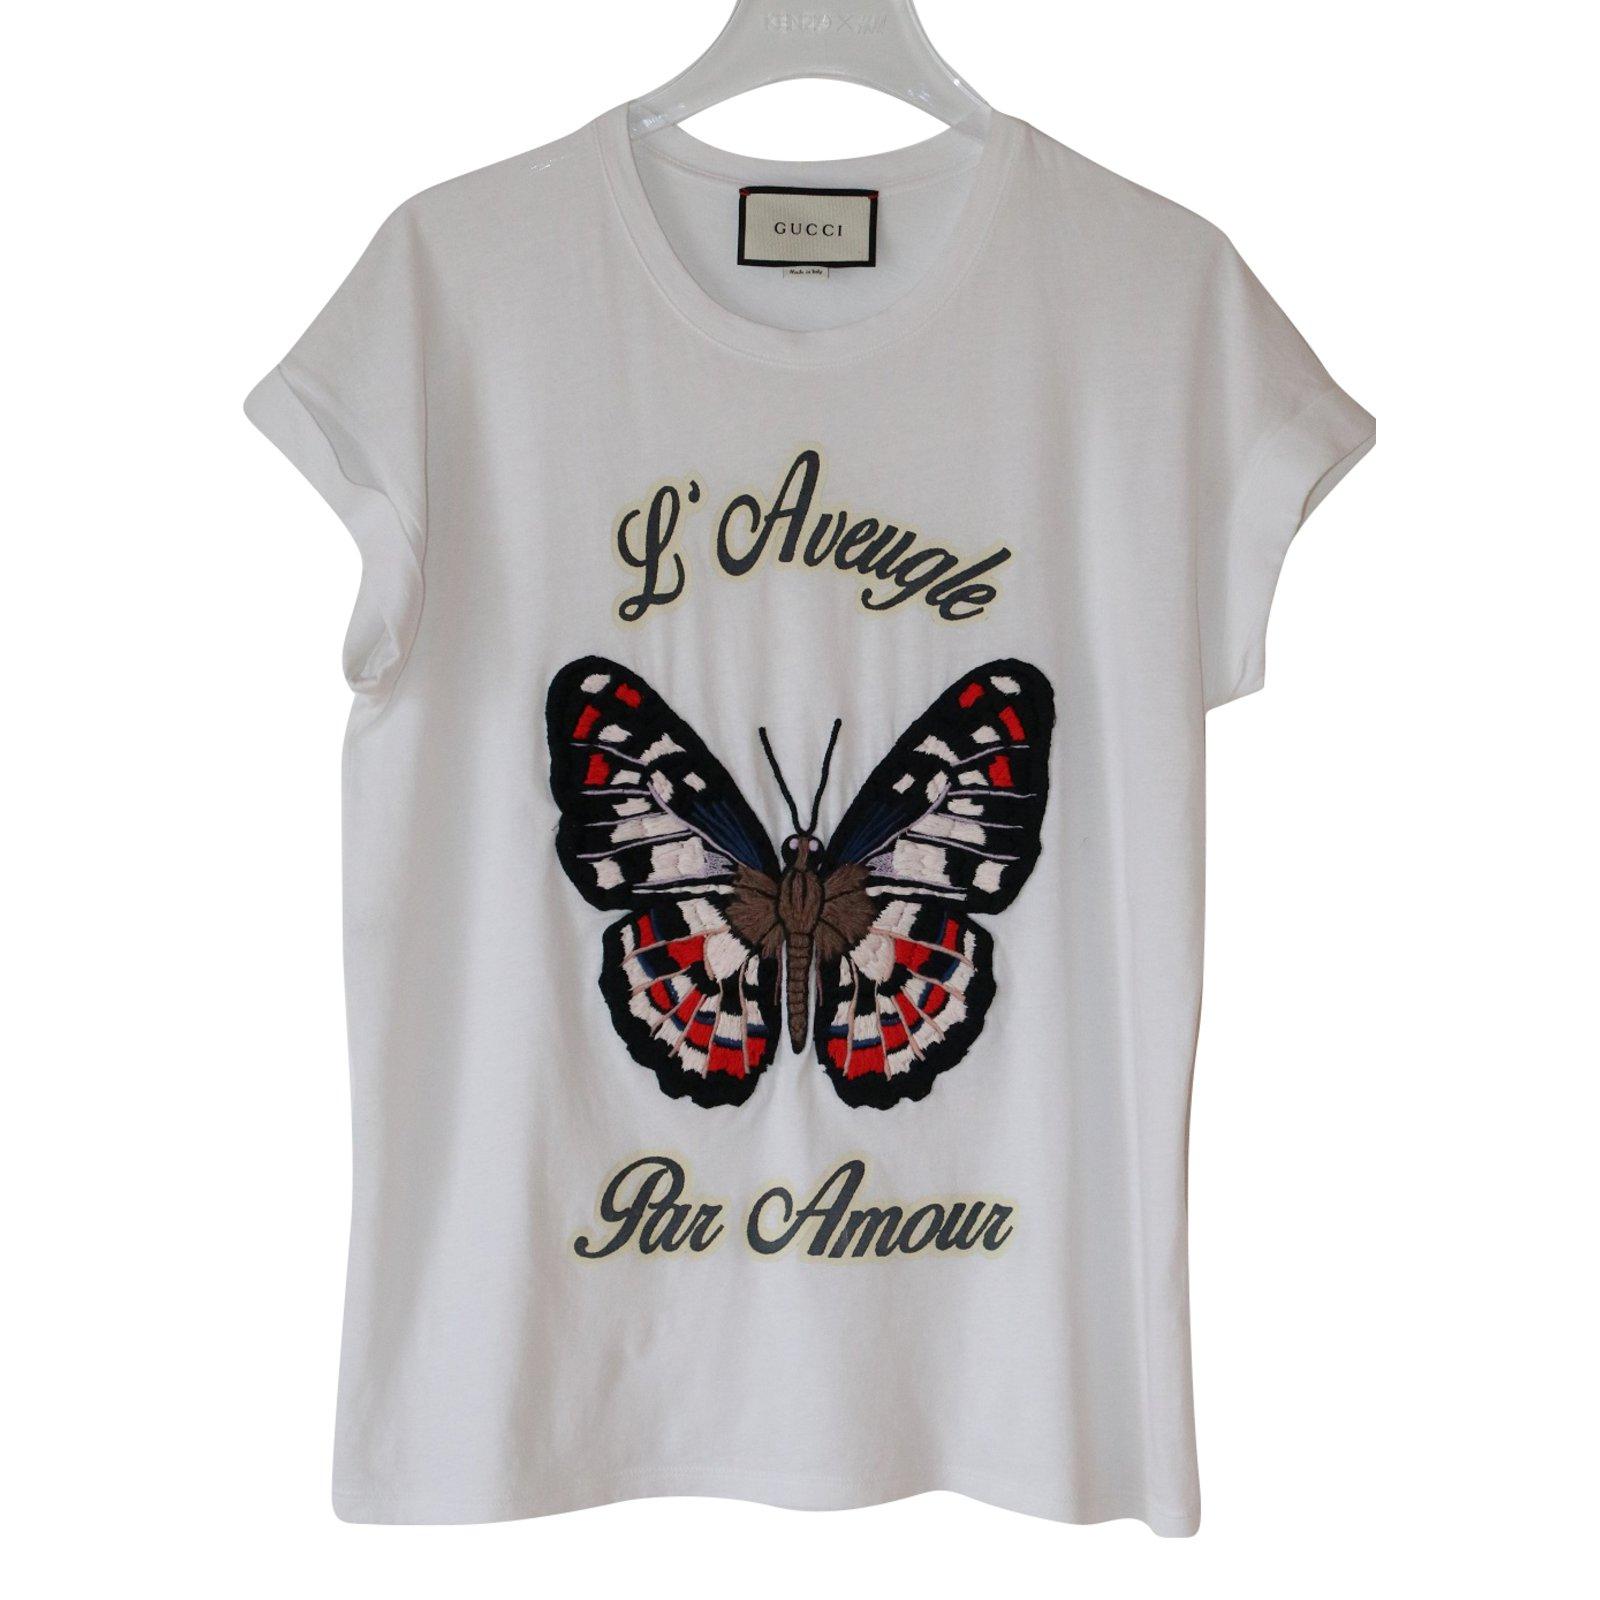 208cb5f02414 Gucci Butterfly T-Shirt Tops Cotton White ref.69384 - Joli Closet